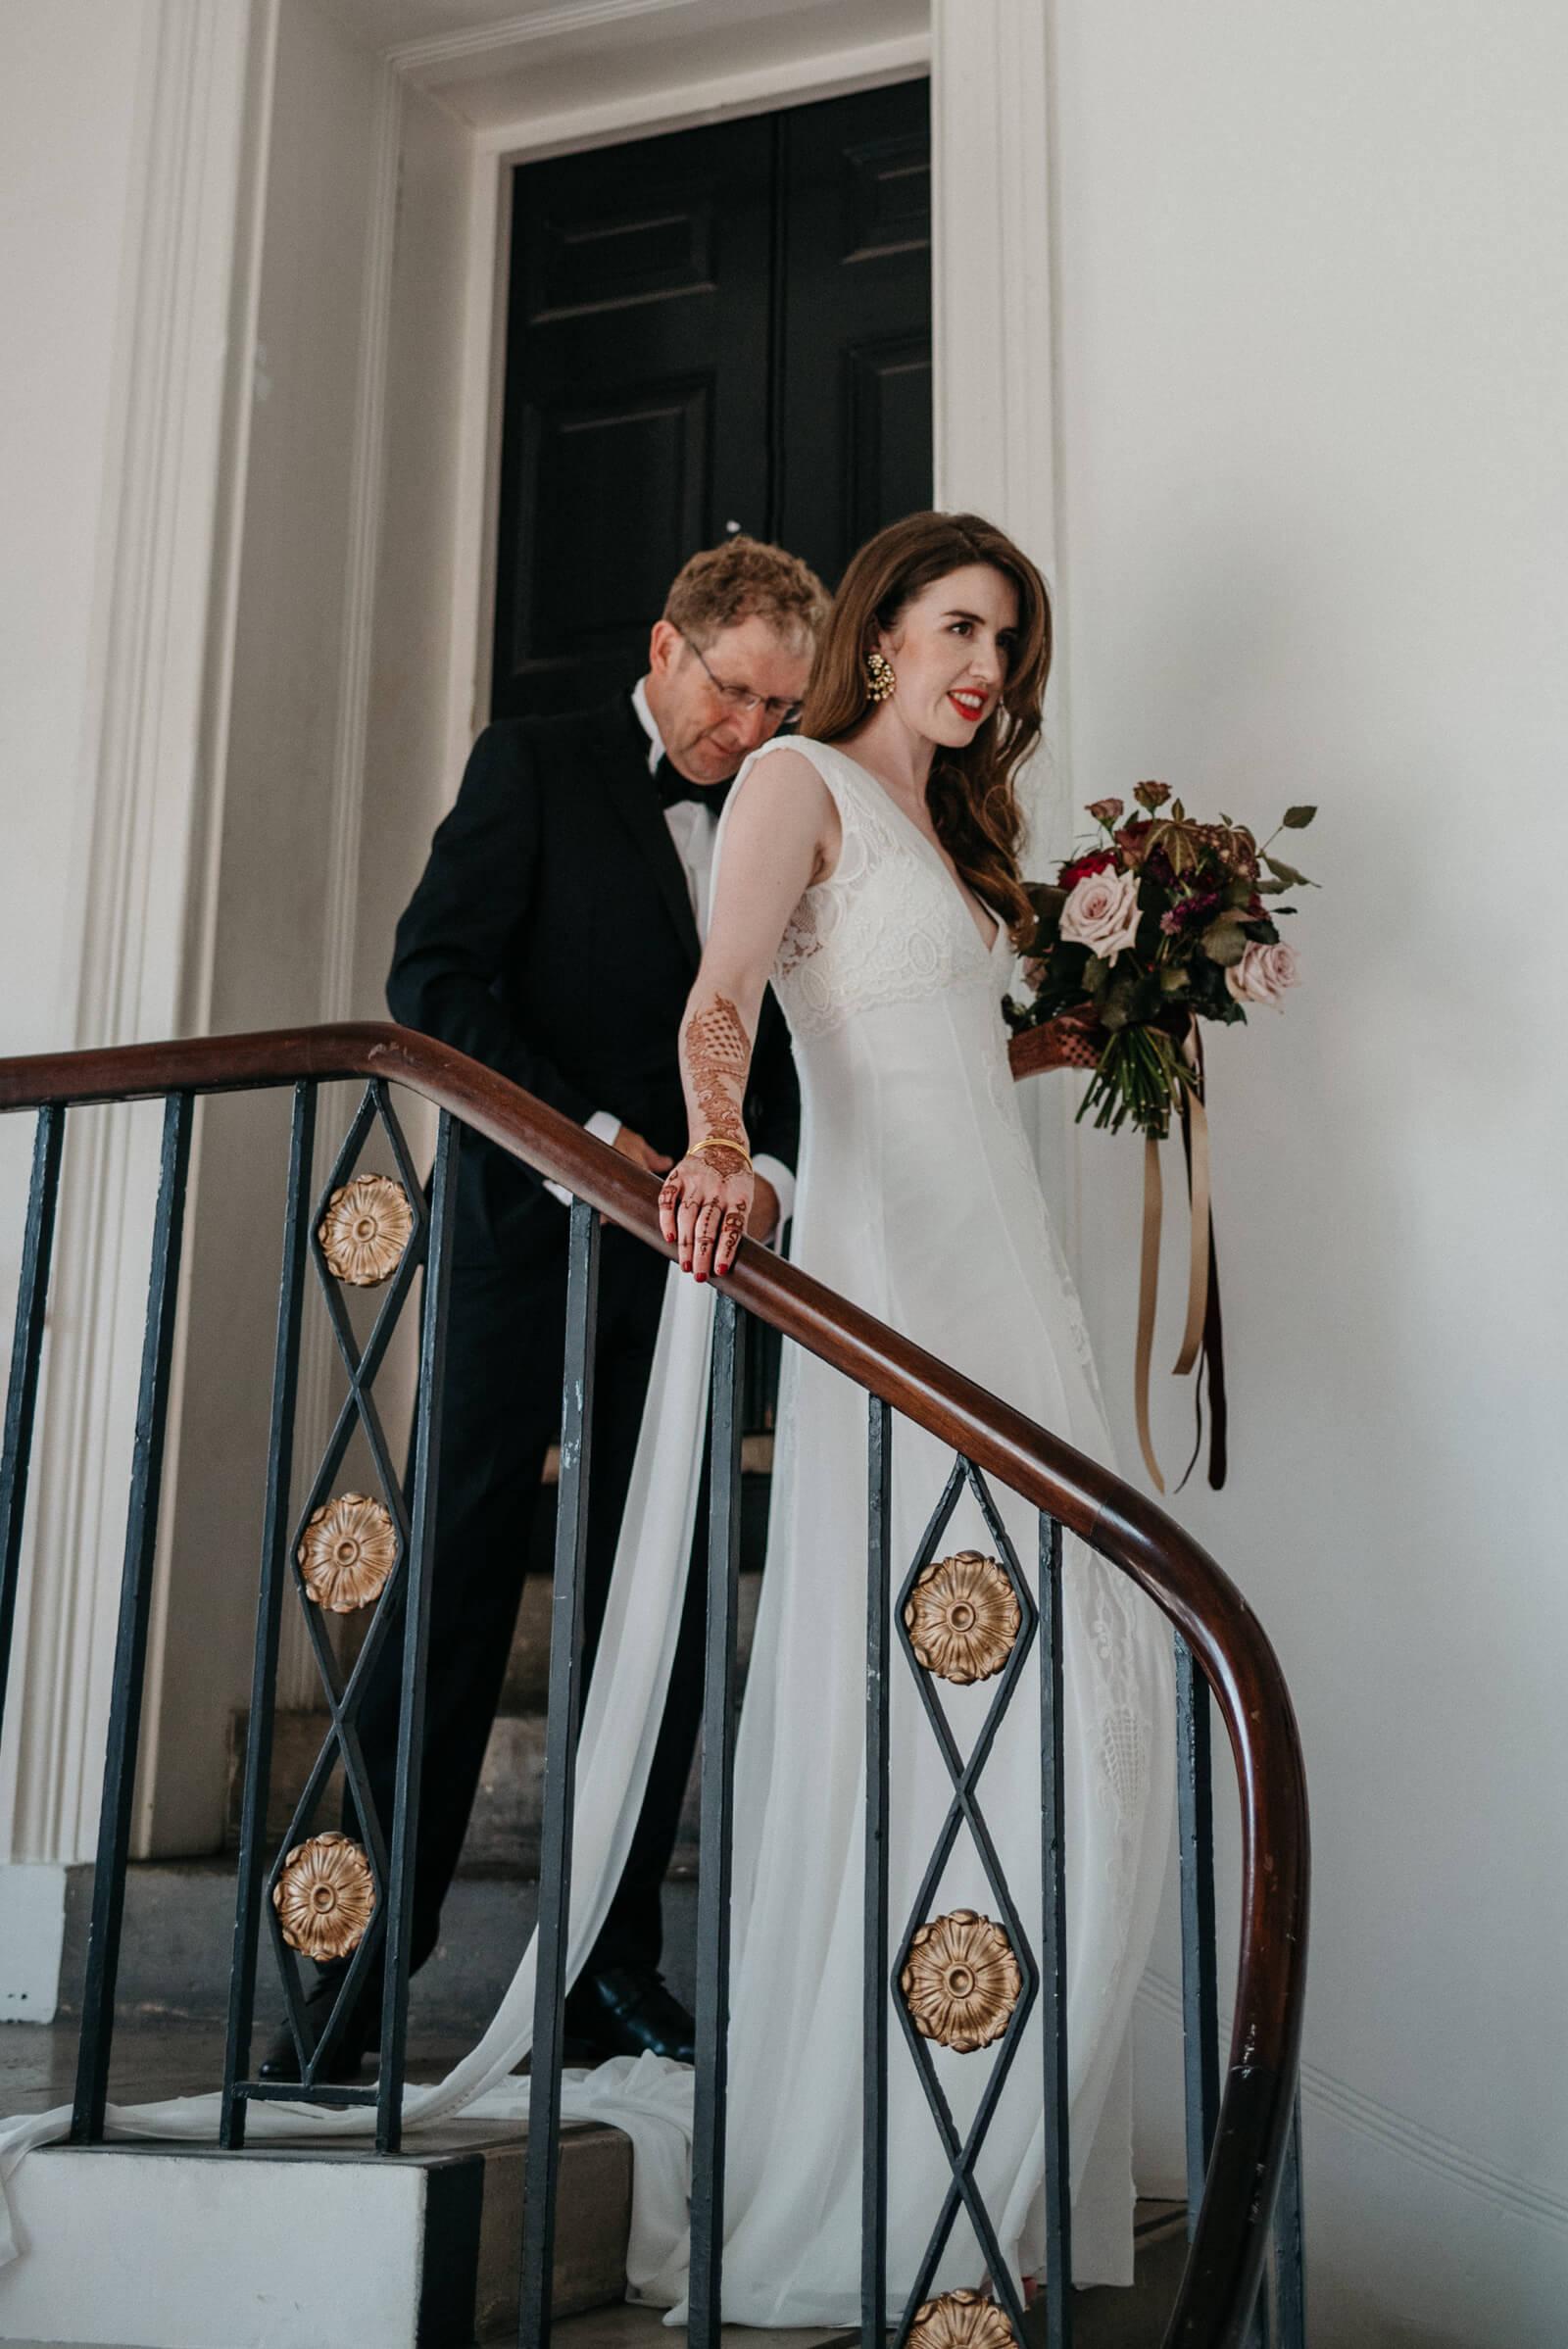 elegant bride moments before marrying at Marylebone One, London